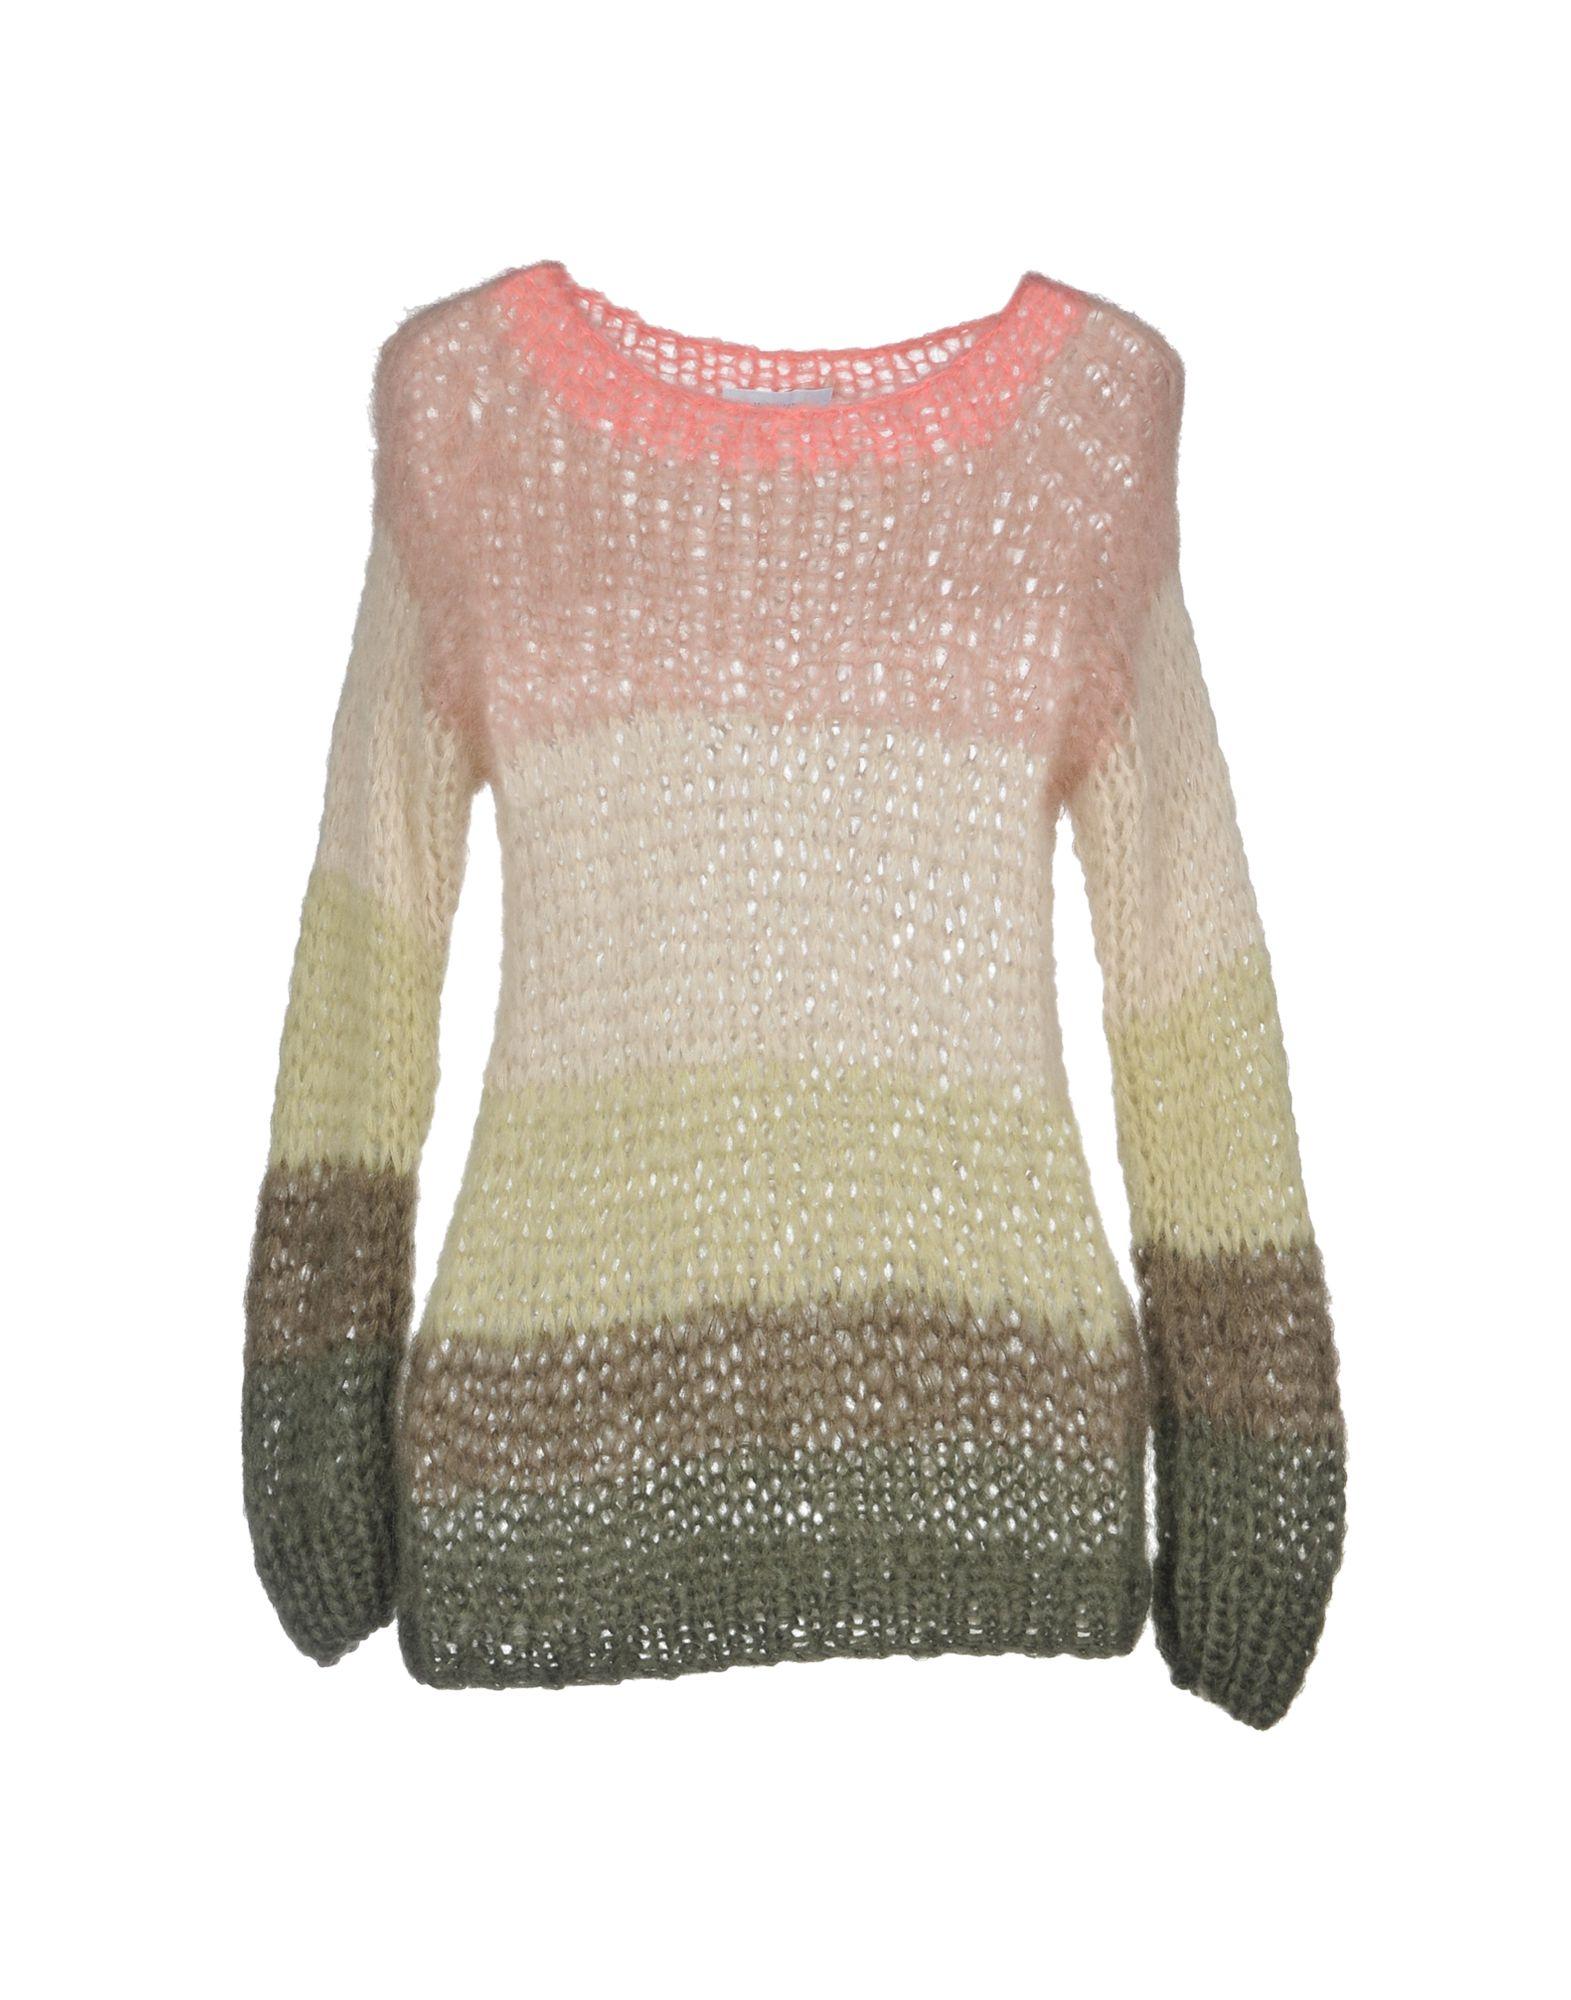 MAIAMI Sweater in Dark Green